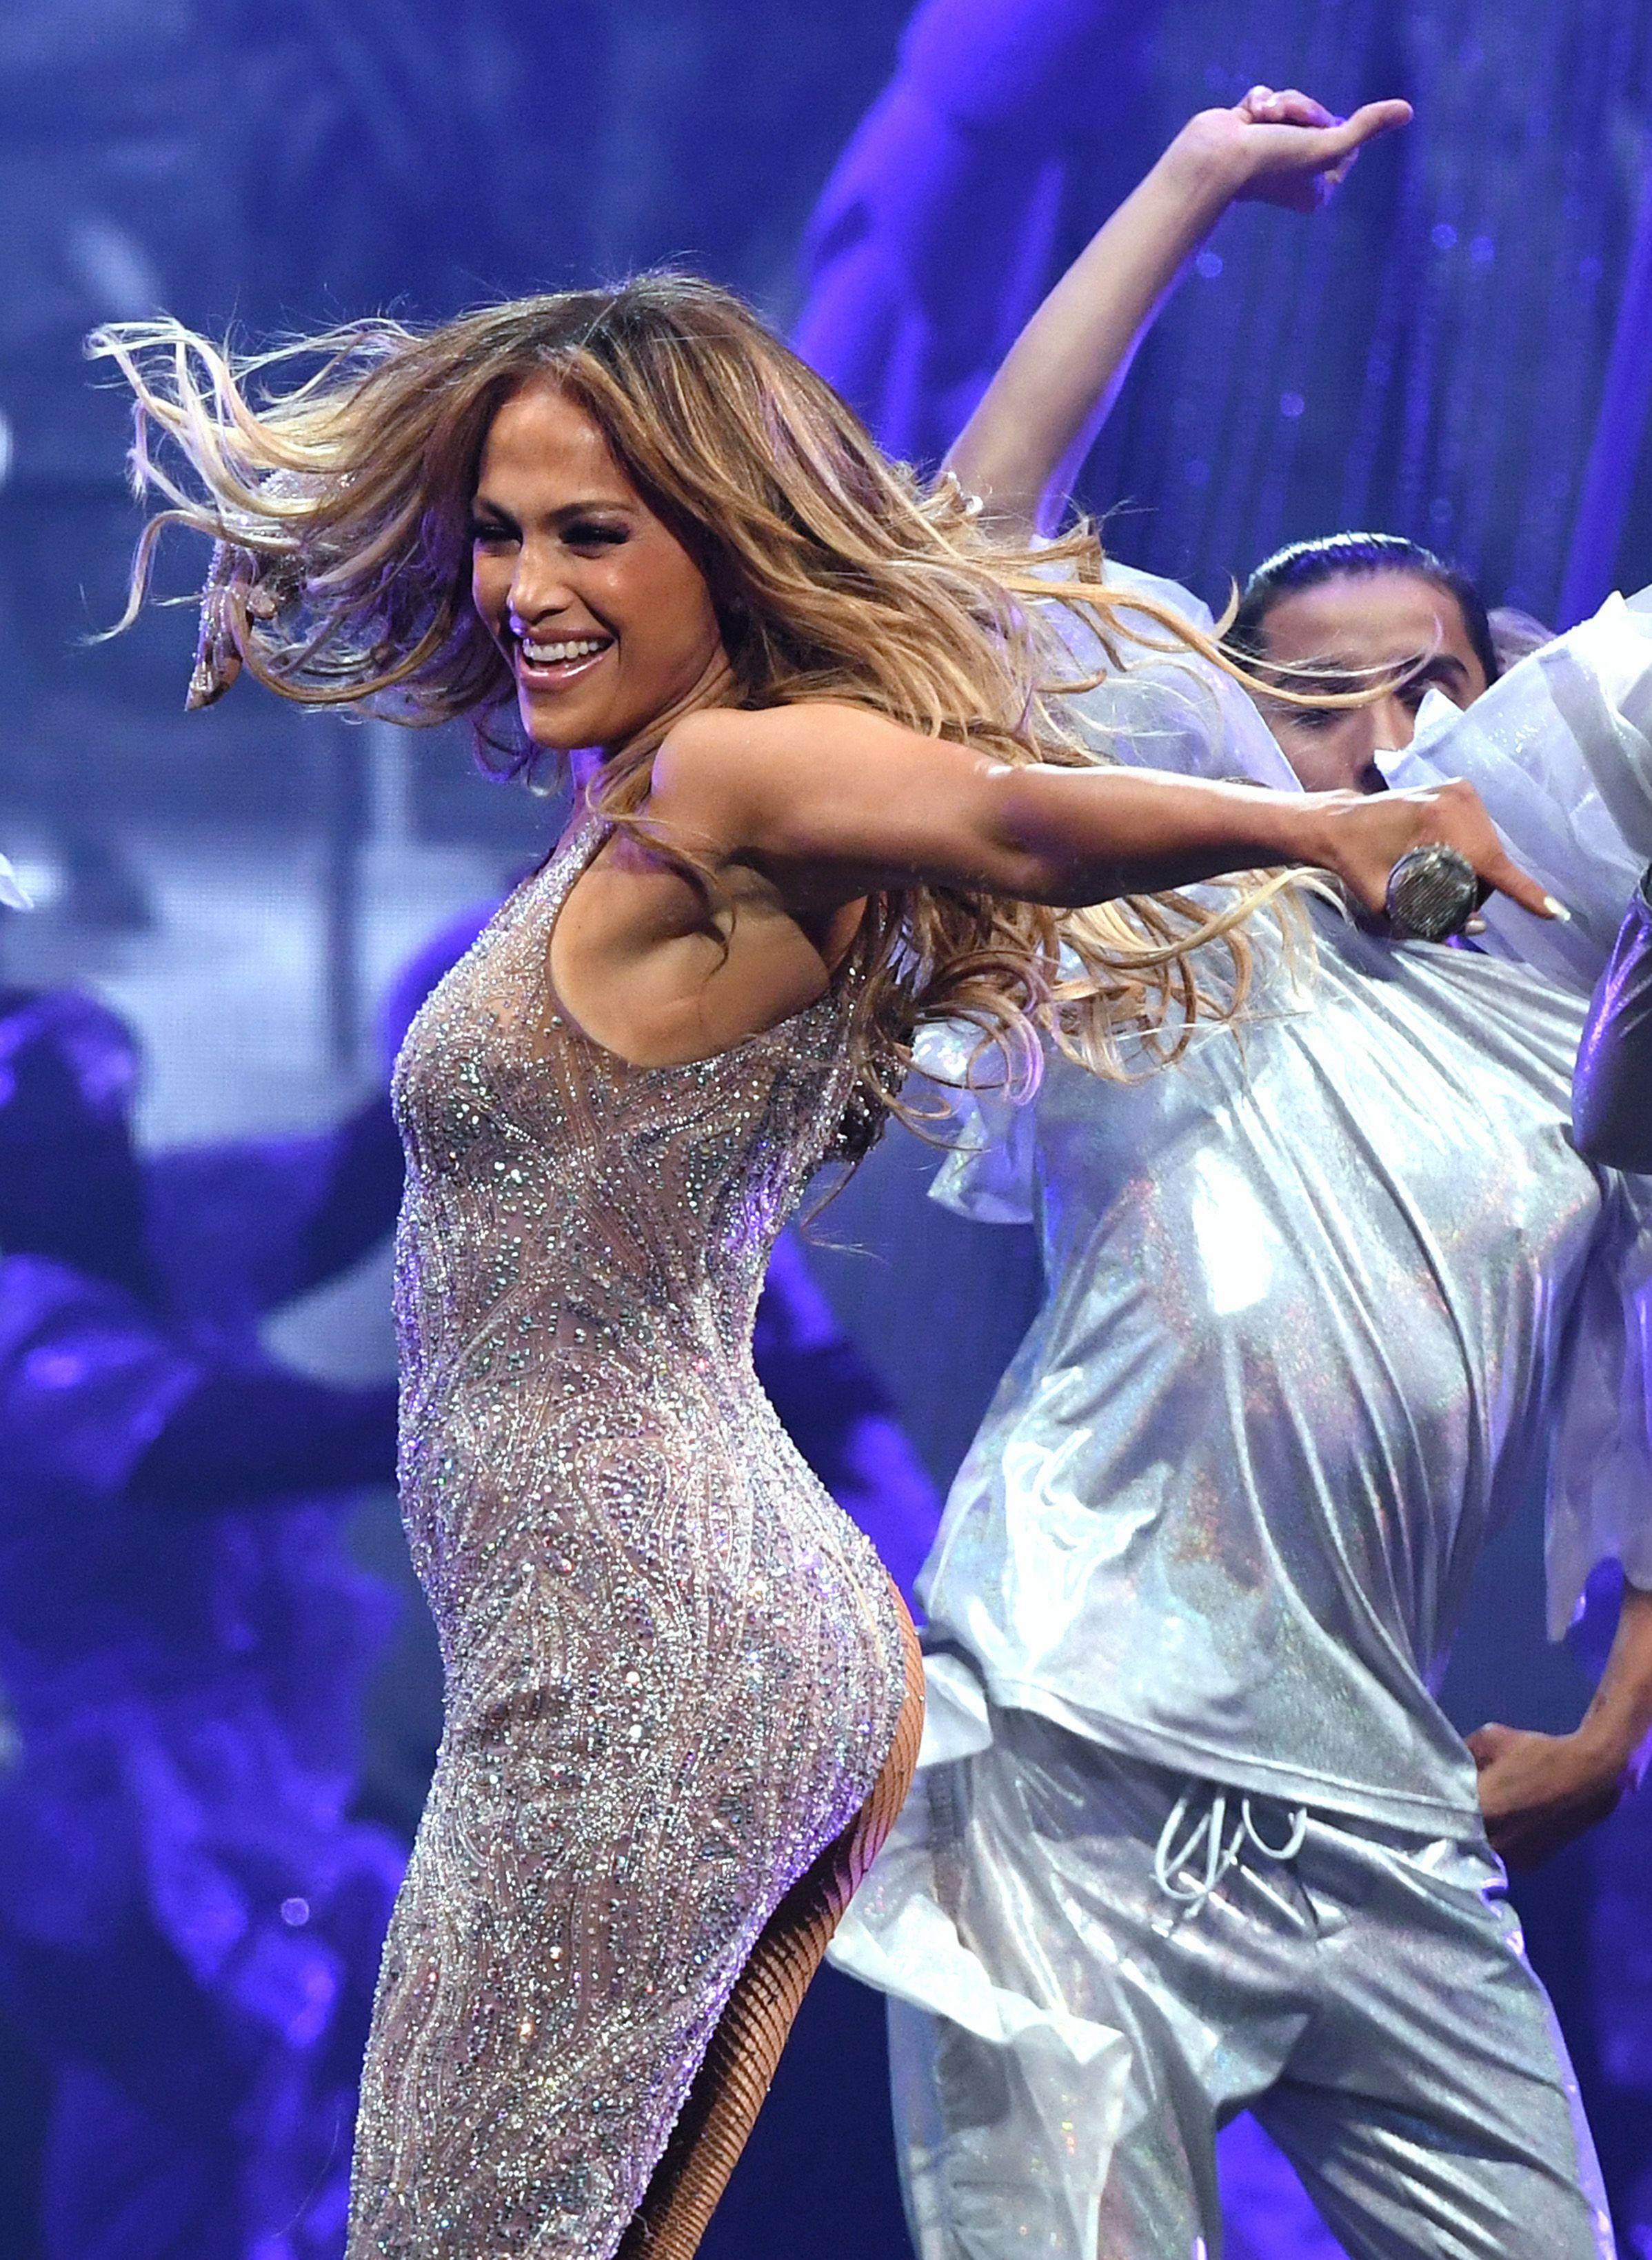 Jennifer Lopez Shows Off Sculpted Abs In Niyama Sol Leggings In New Instagram Post